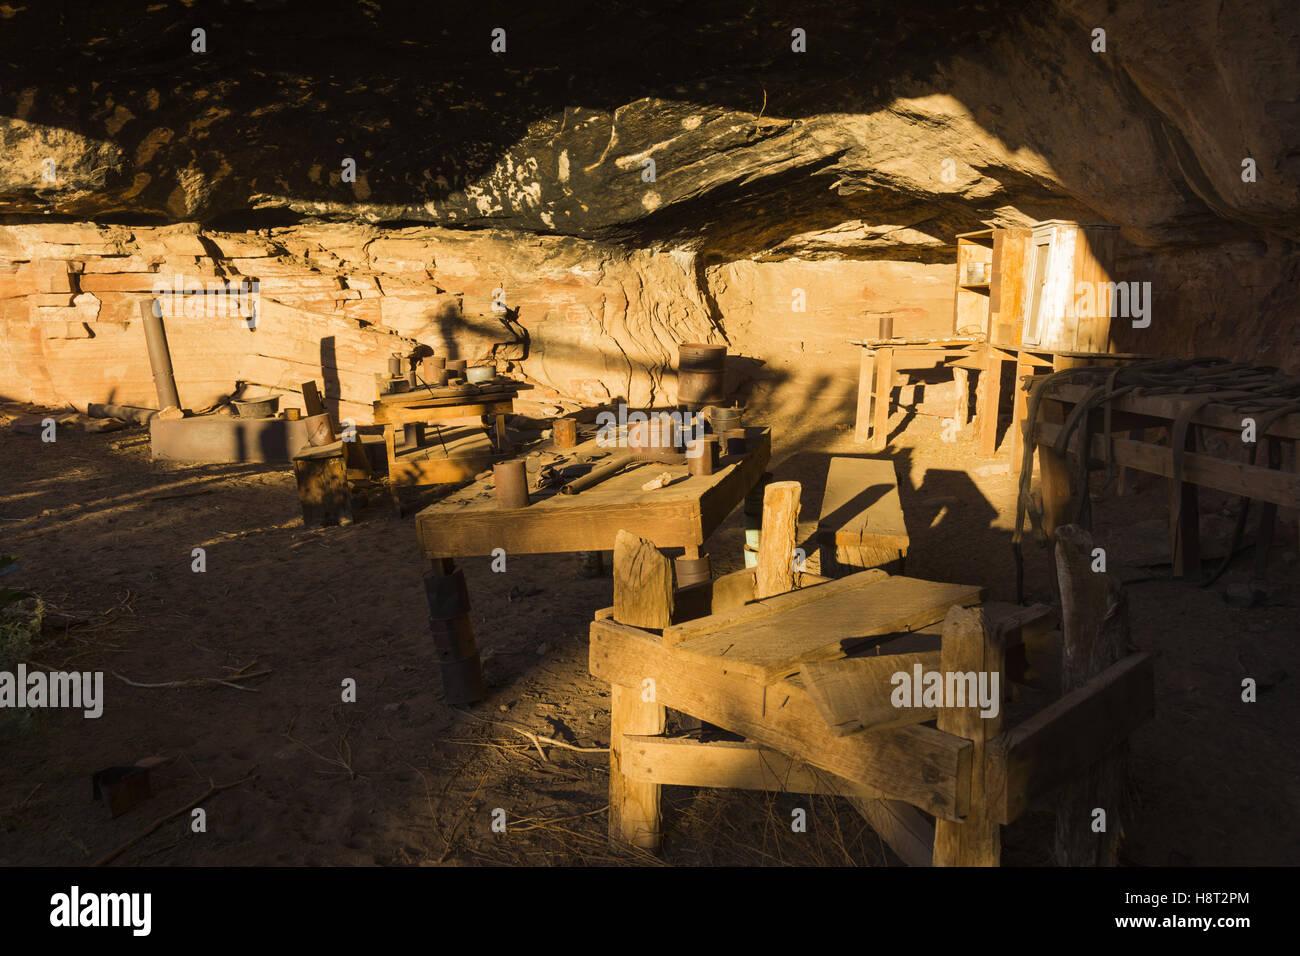 Utah, Canyonlands National Park, Needles District, Höhle Frühling Cowboy Camp Stockbild